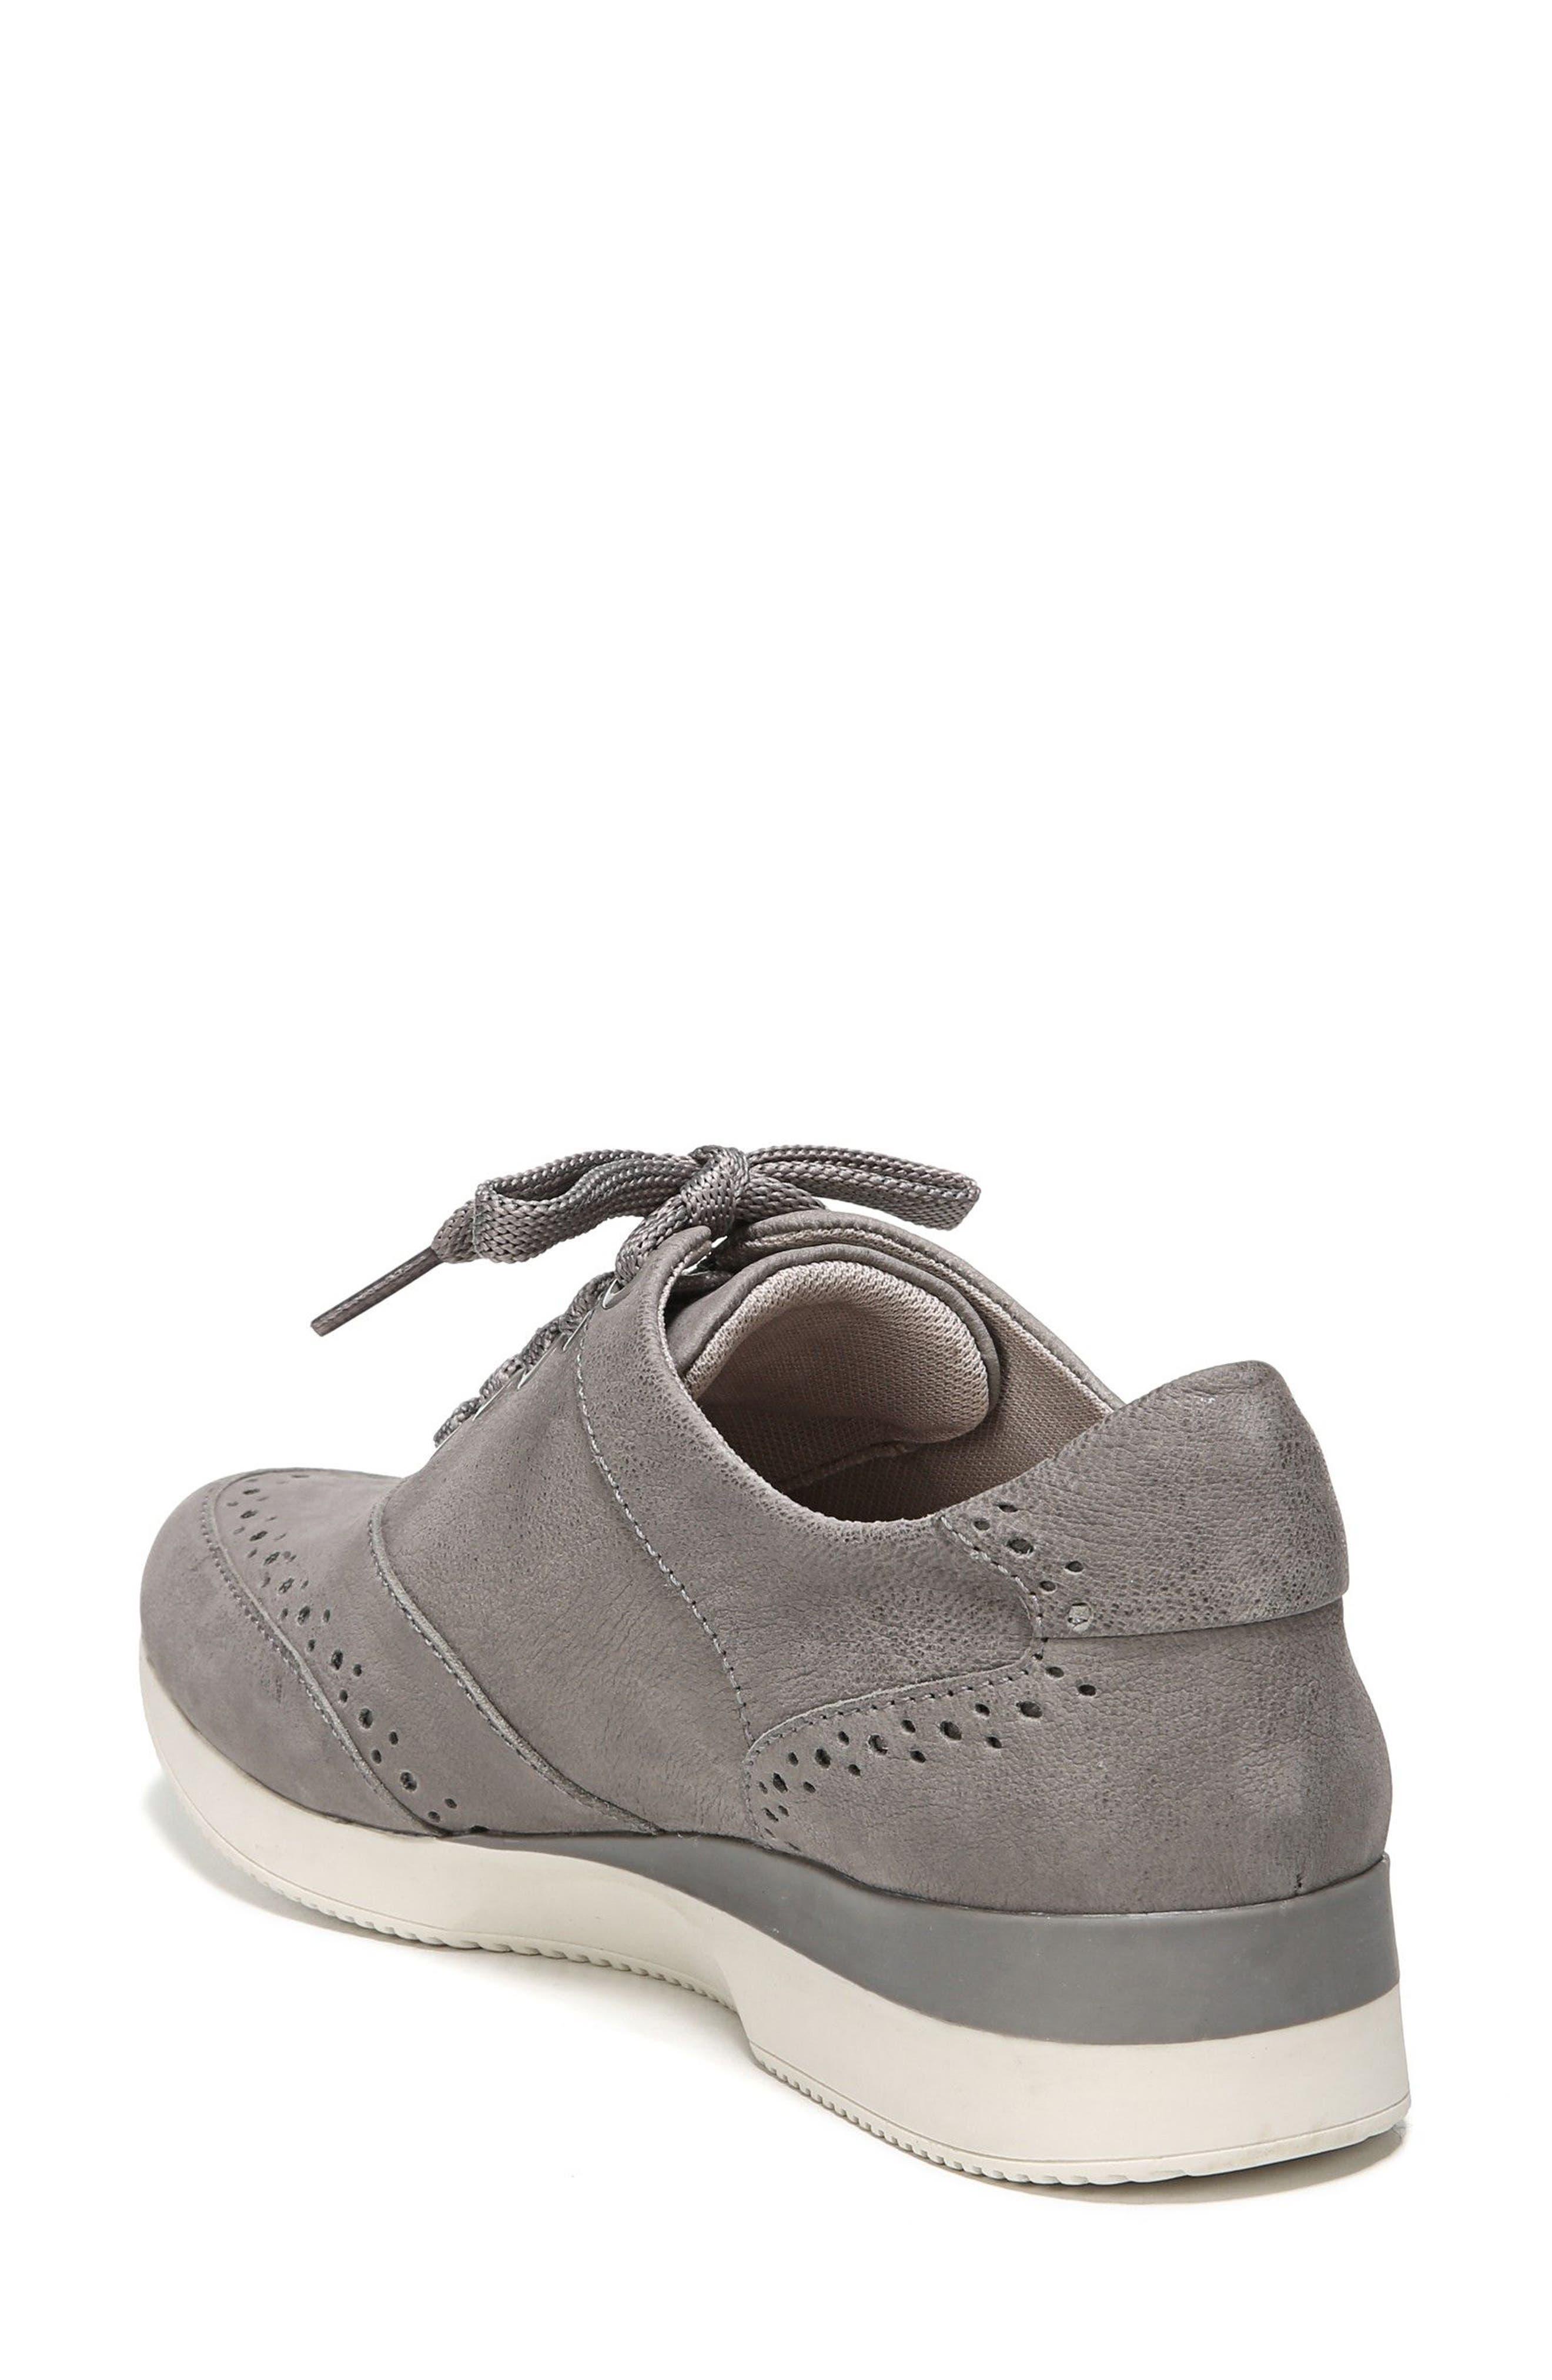 Jimi 2 Perforated Sneaker,                             Alternate thumbnail 2, color,                             Modern Grey Nubuck Leather